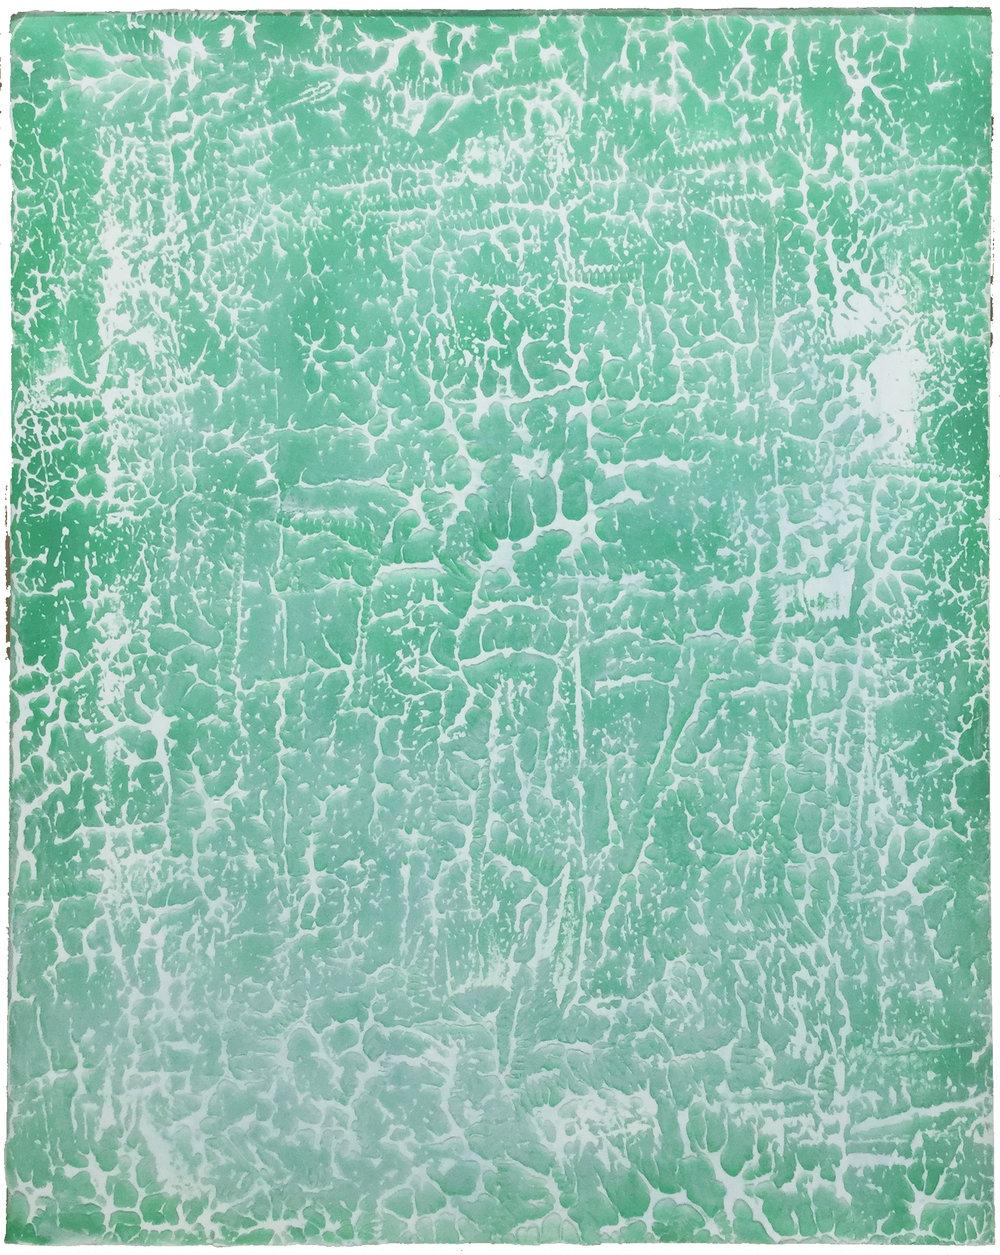 "Pierre Julien,  Ronchamps 03,  2017, plaster and spray paint on gypsum, 30"" x 24"" (76x 61 cm)"